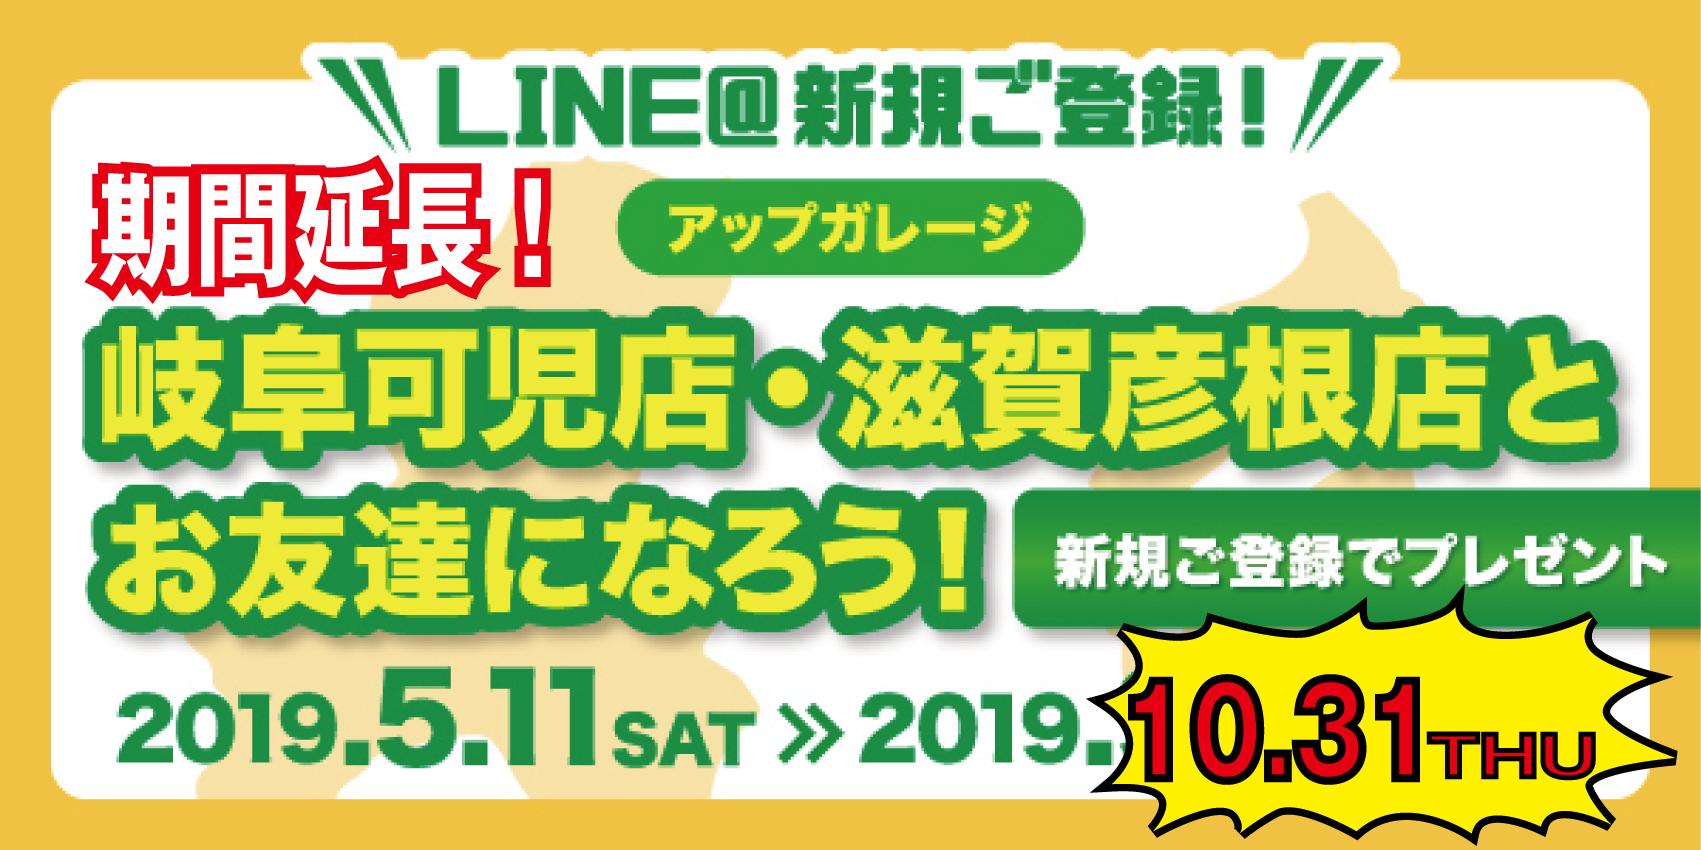 【岐阜可児店・滋賀彦根店】期間延長!第二弾 新規ご登録キャンペーン!!